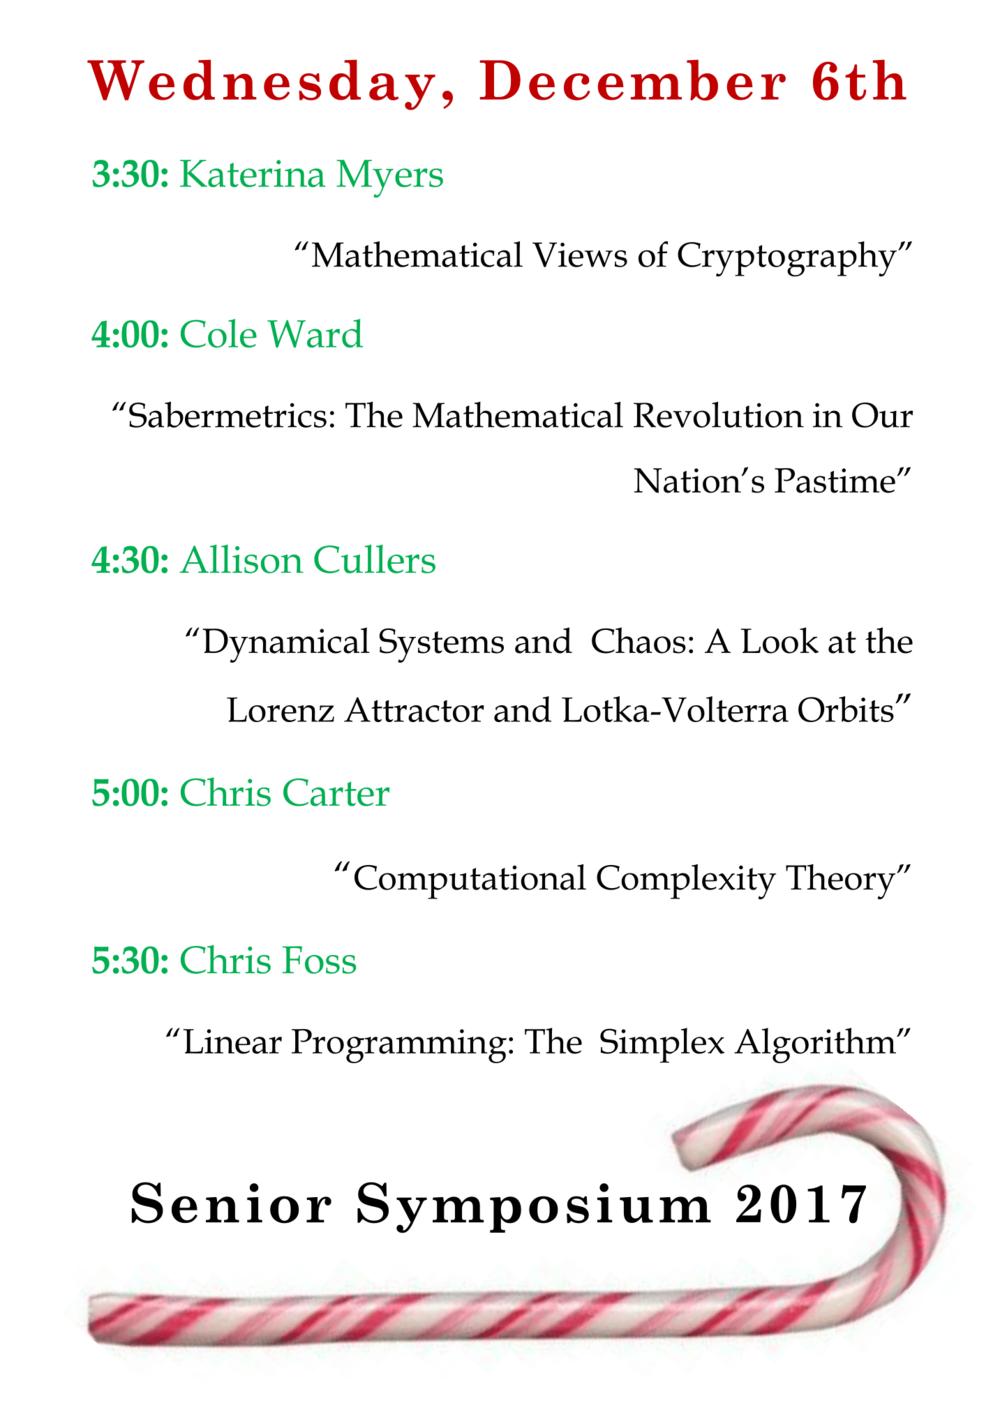 Senior Symposium 2017 program (002)-1.png